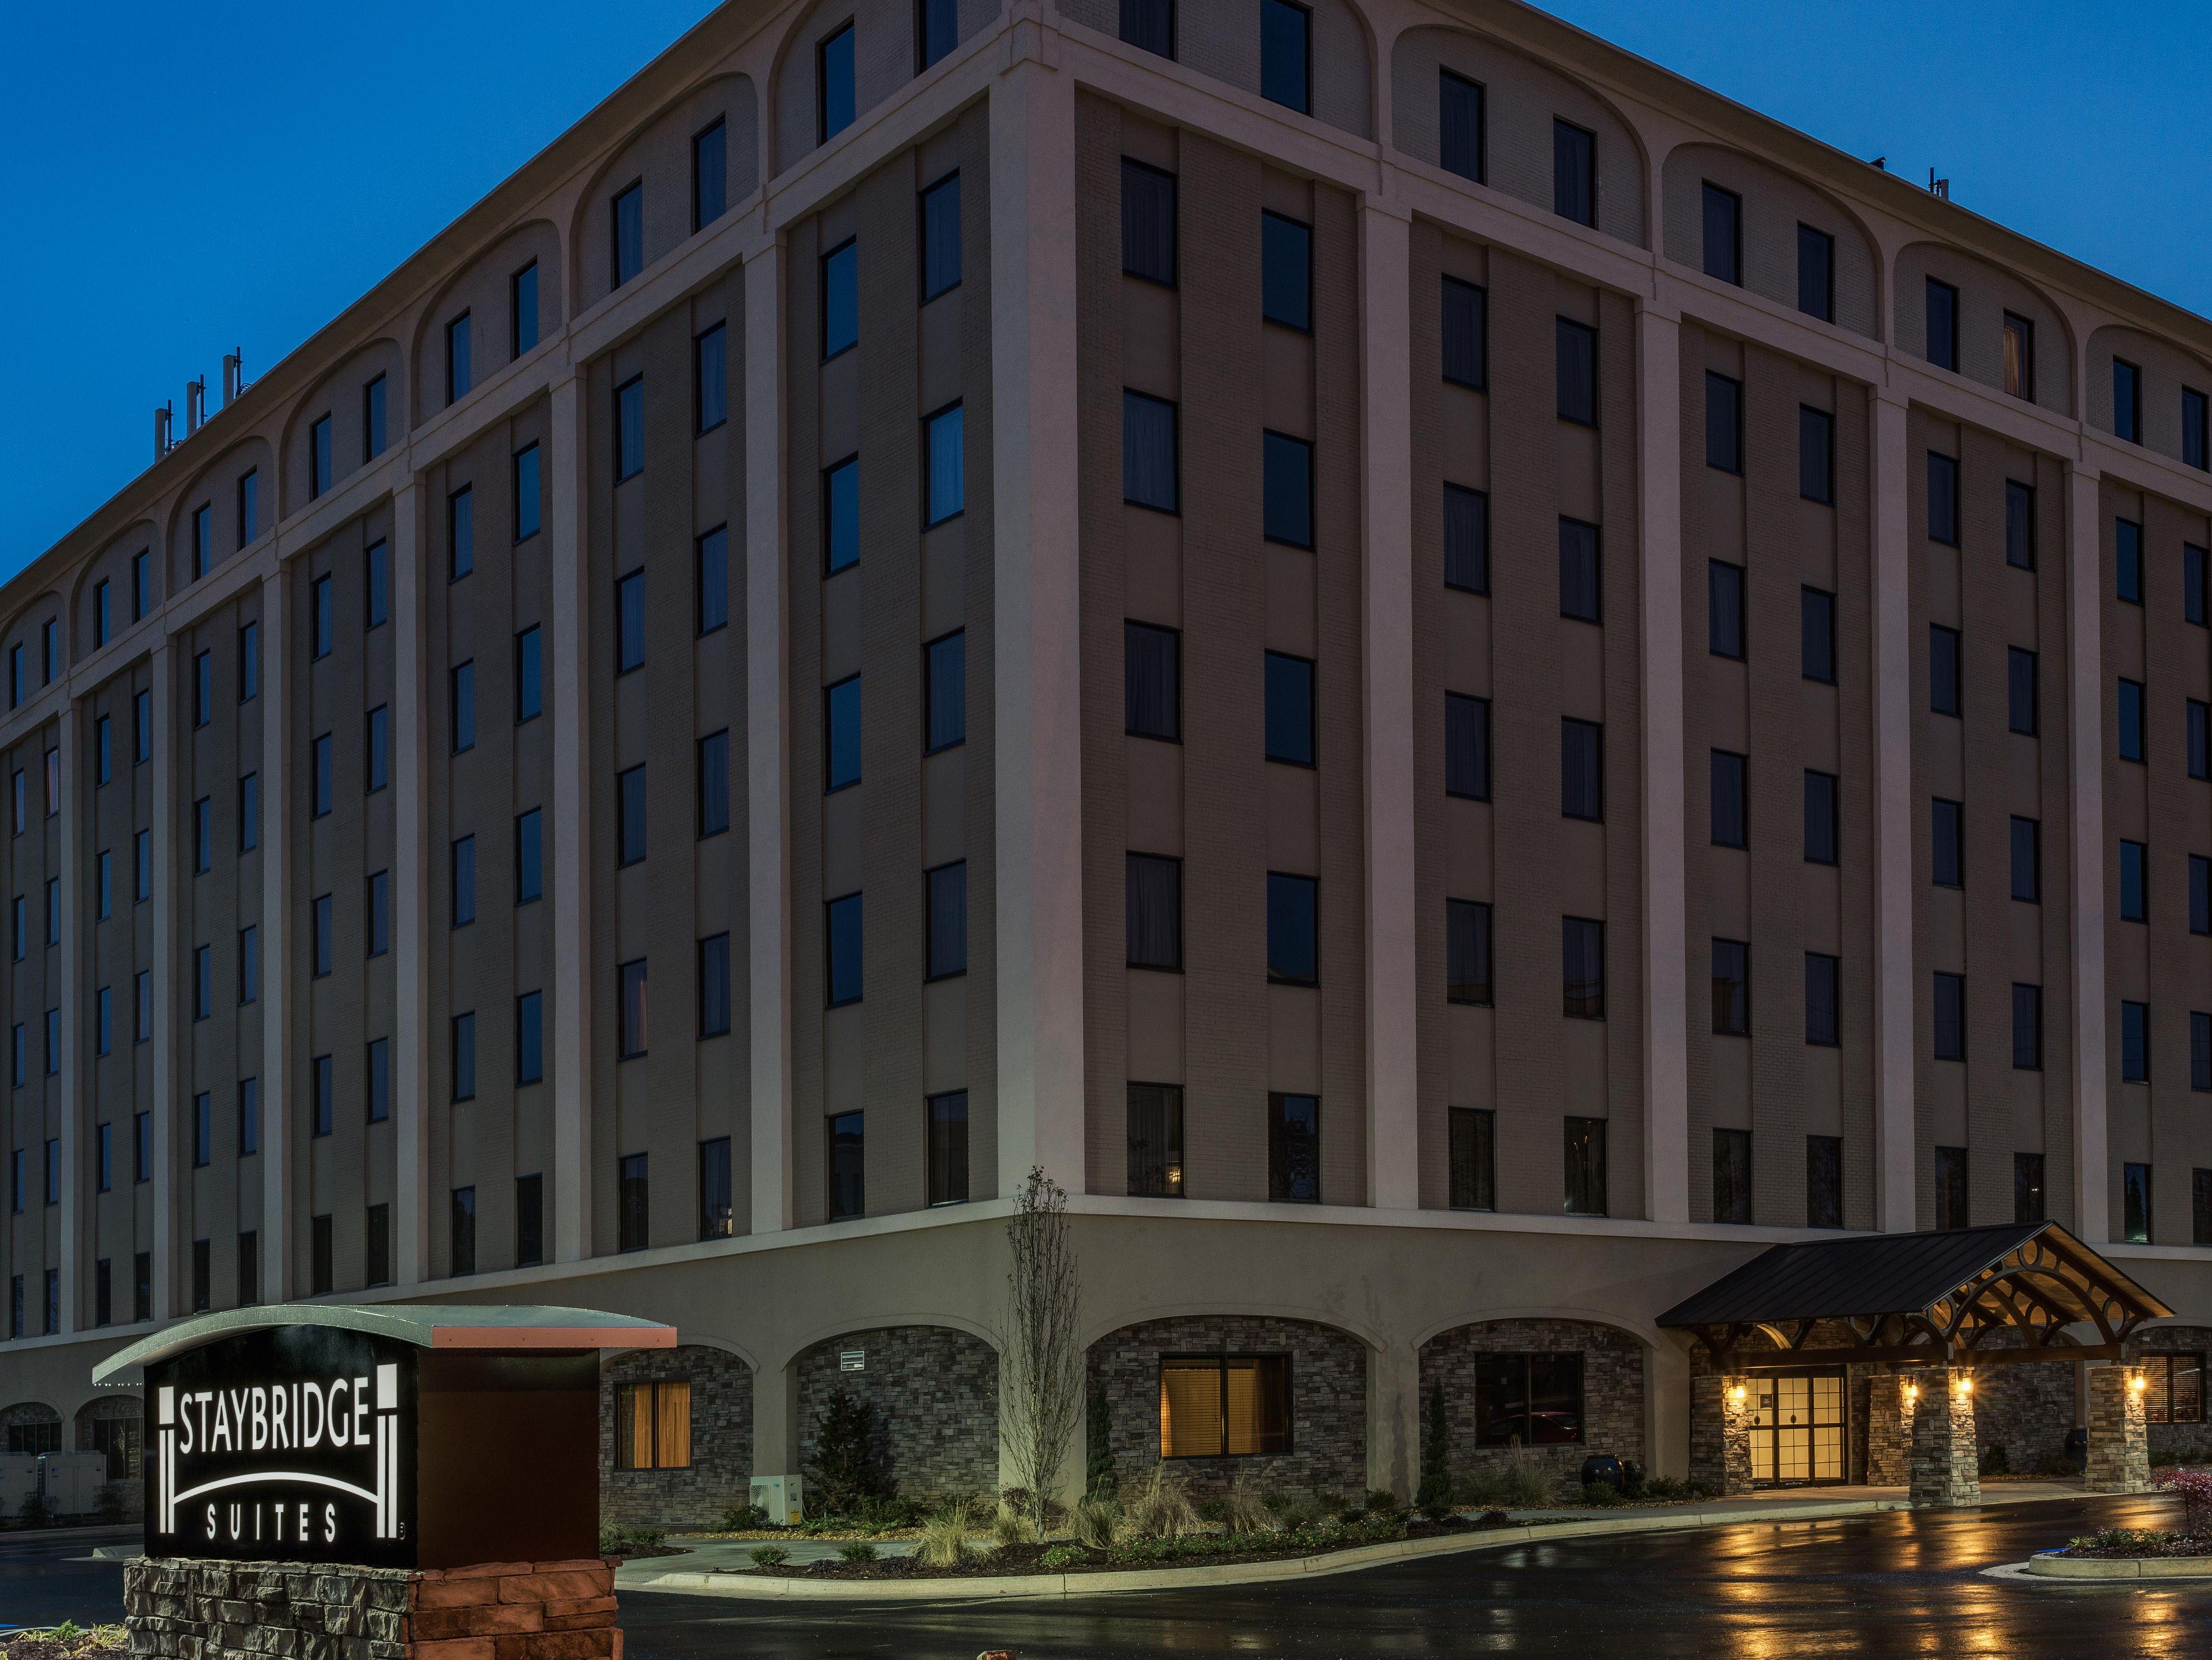 staybridge suites atlanta extended stay hotels by ihg